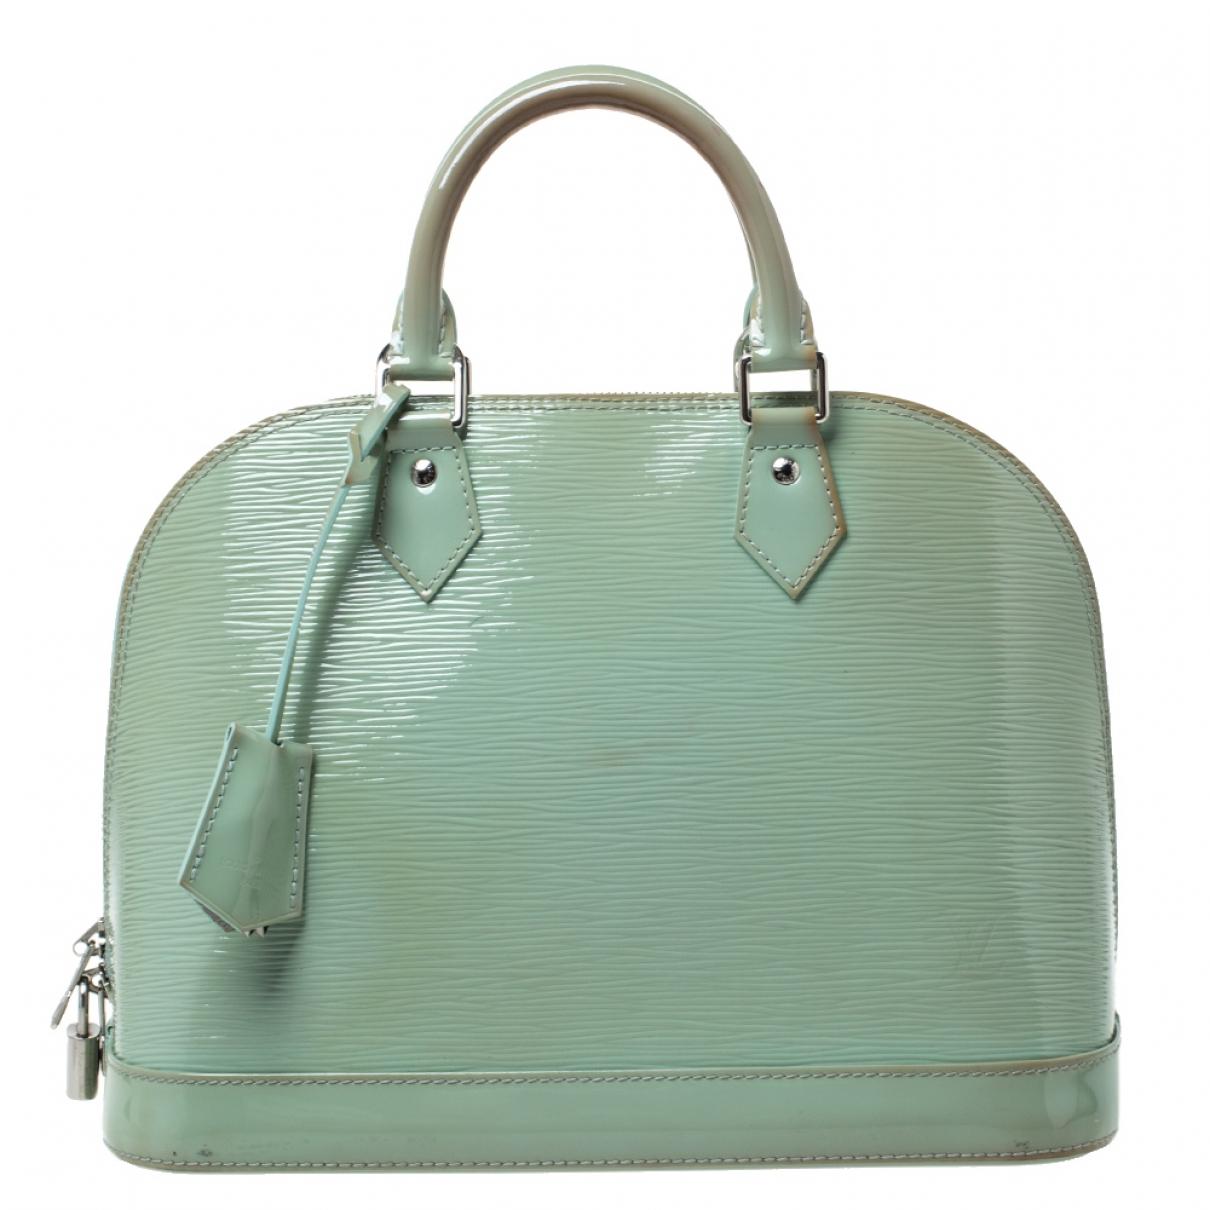 Louis Vuitton - Sac a main Alma pour femme en cuir verni